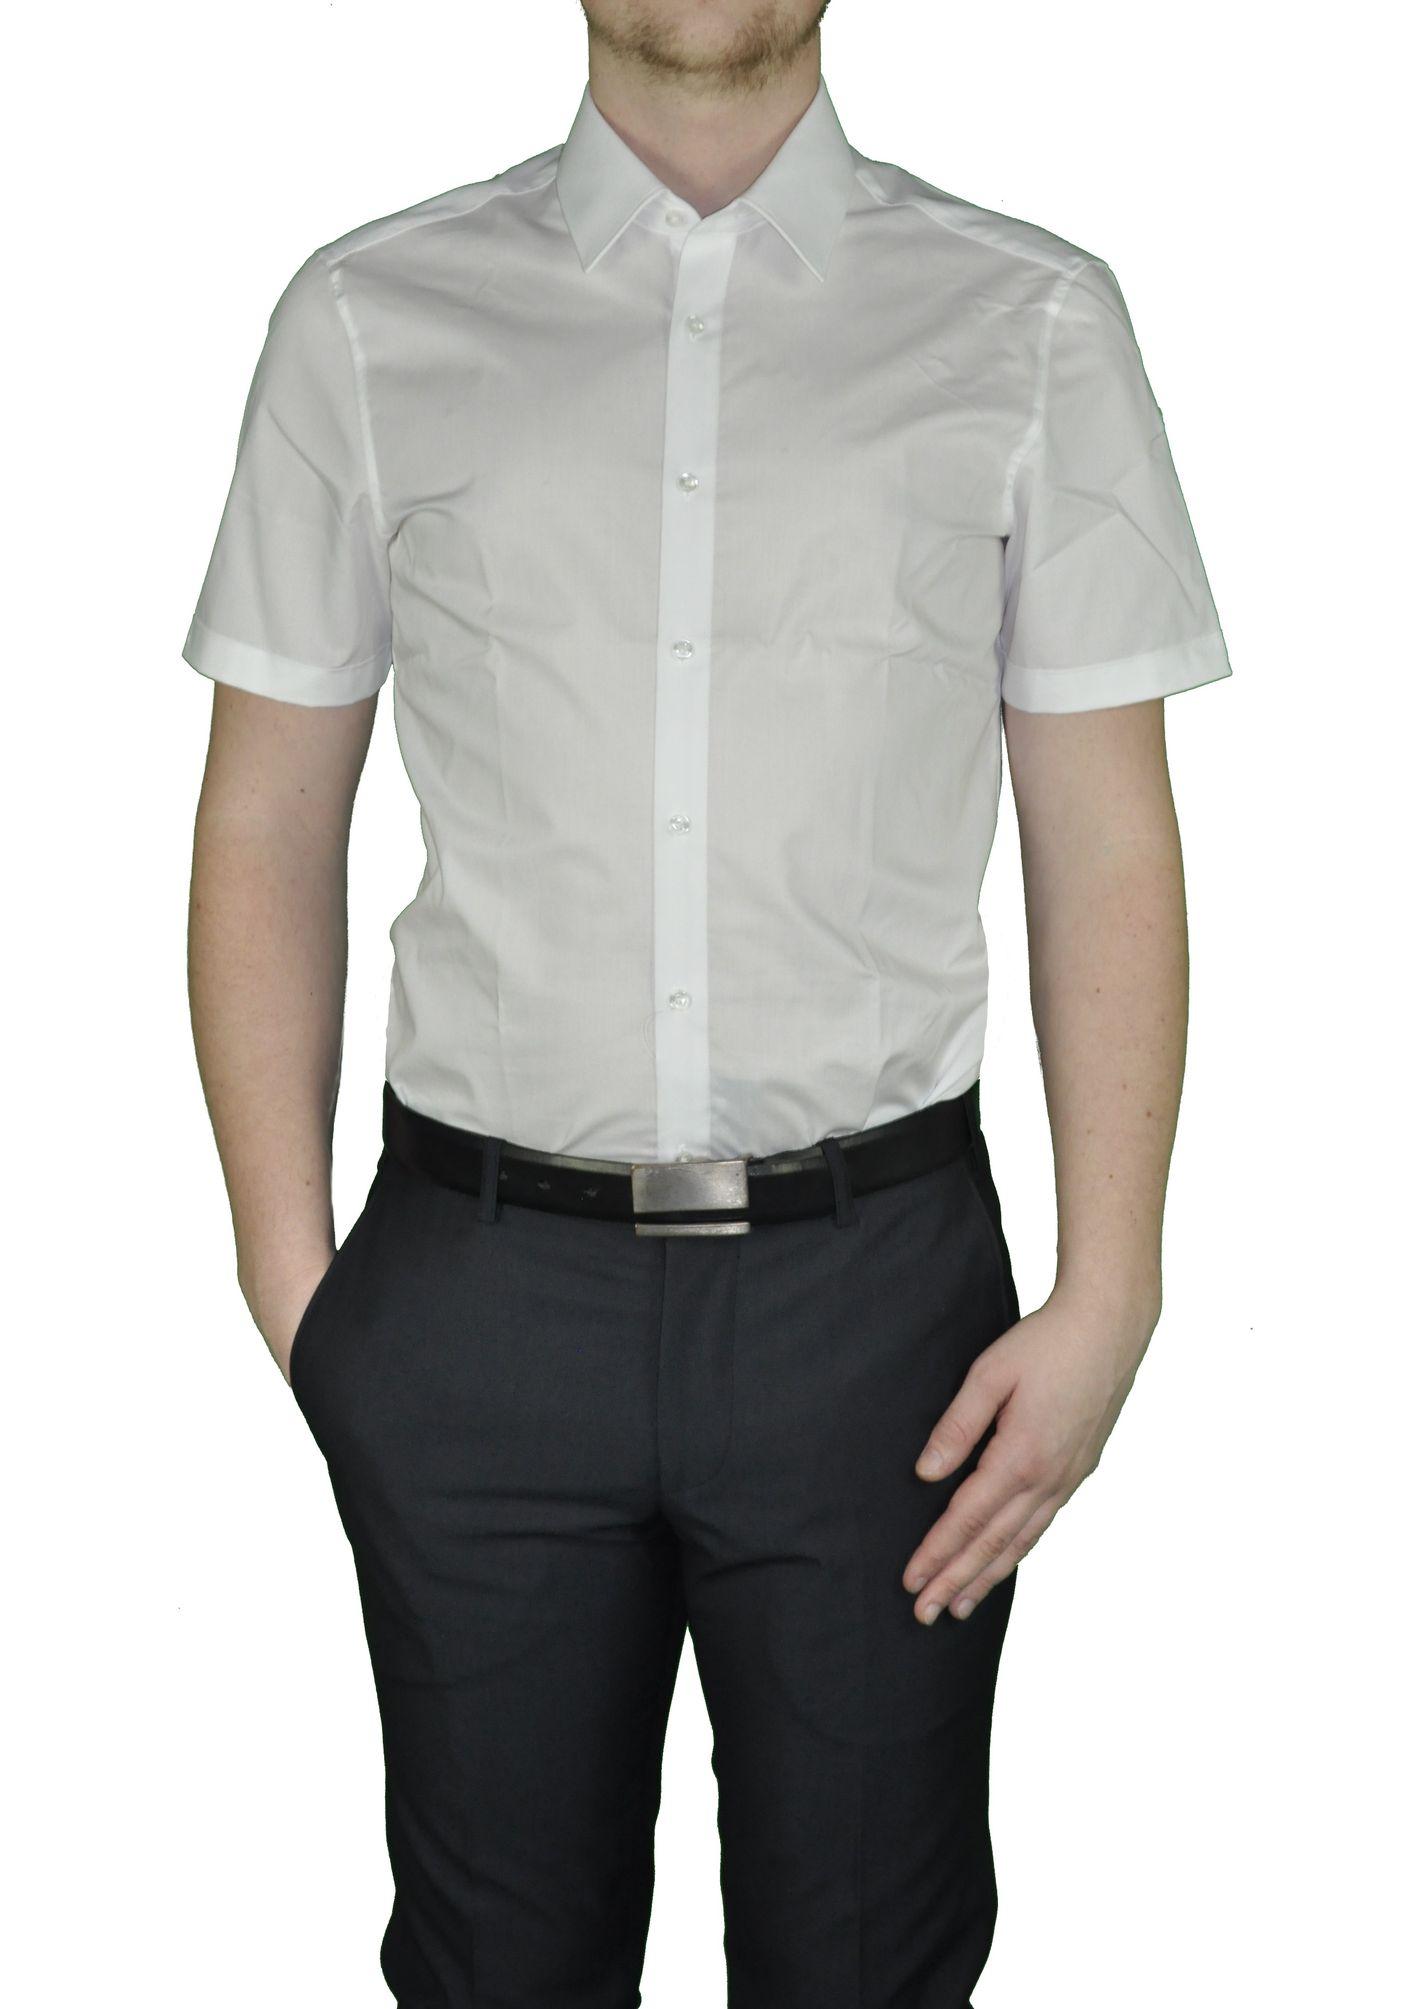 newest 5451c 3e8c1 Bügelfreies Herren Slim fit kurzarm Hemd in verschiedenen Farben Marke  Redmond (400930)